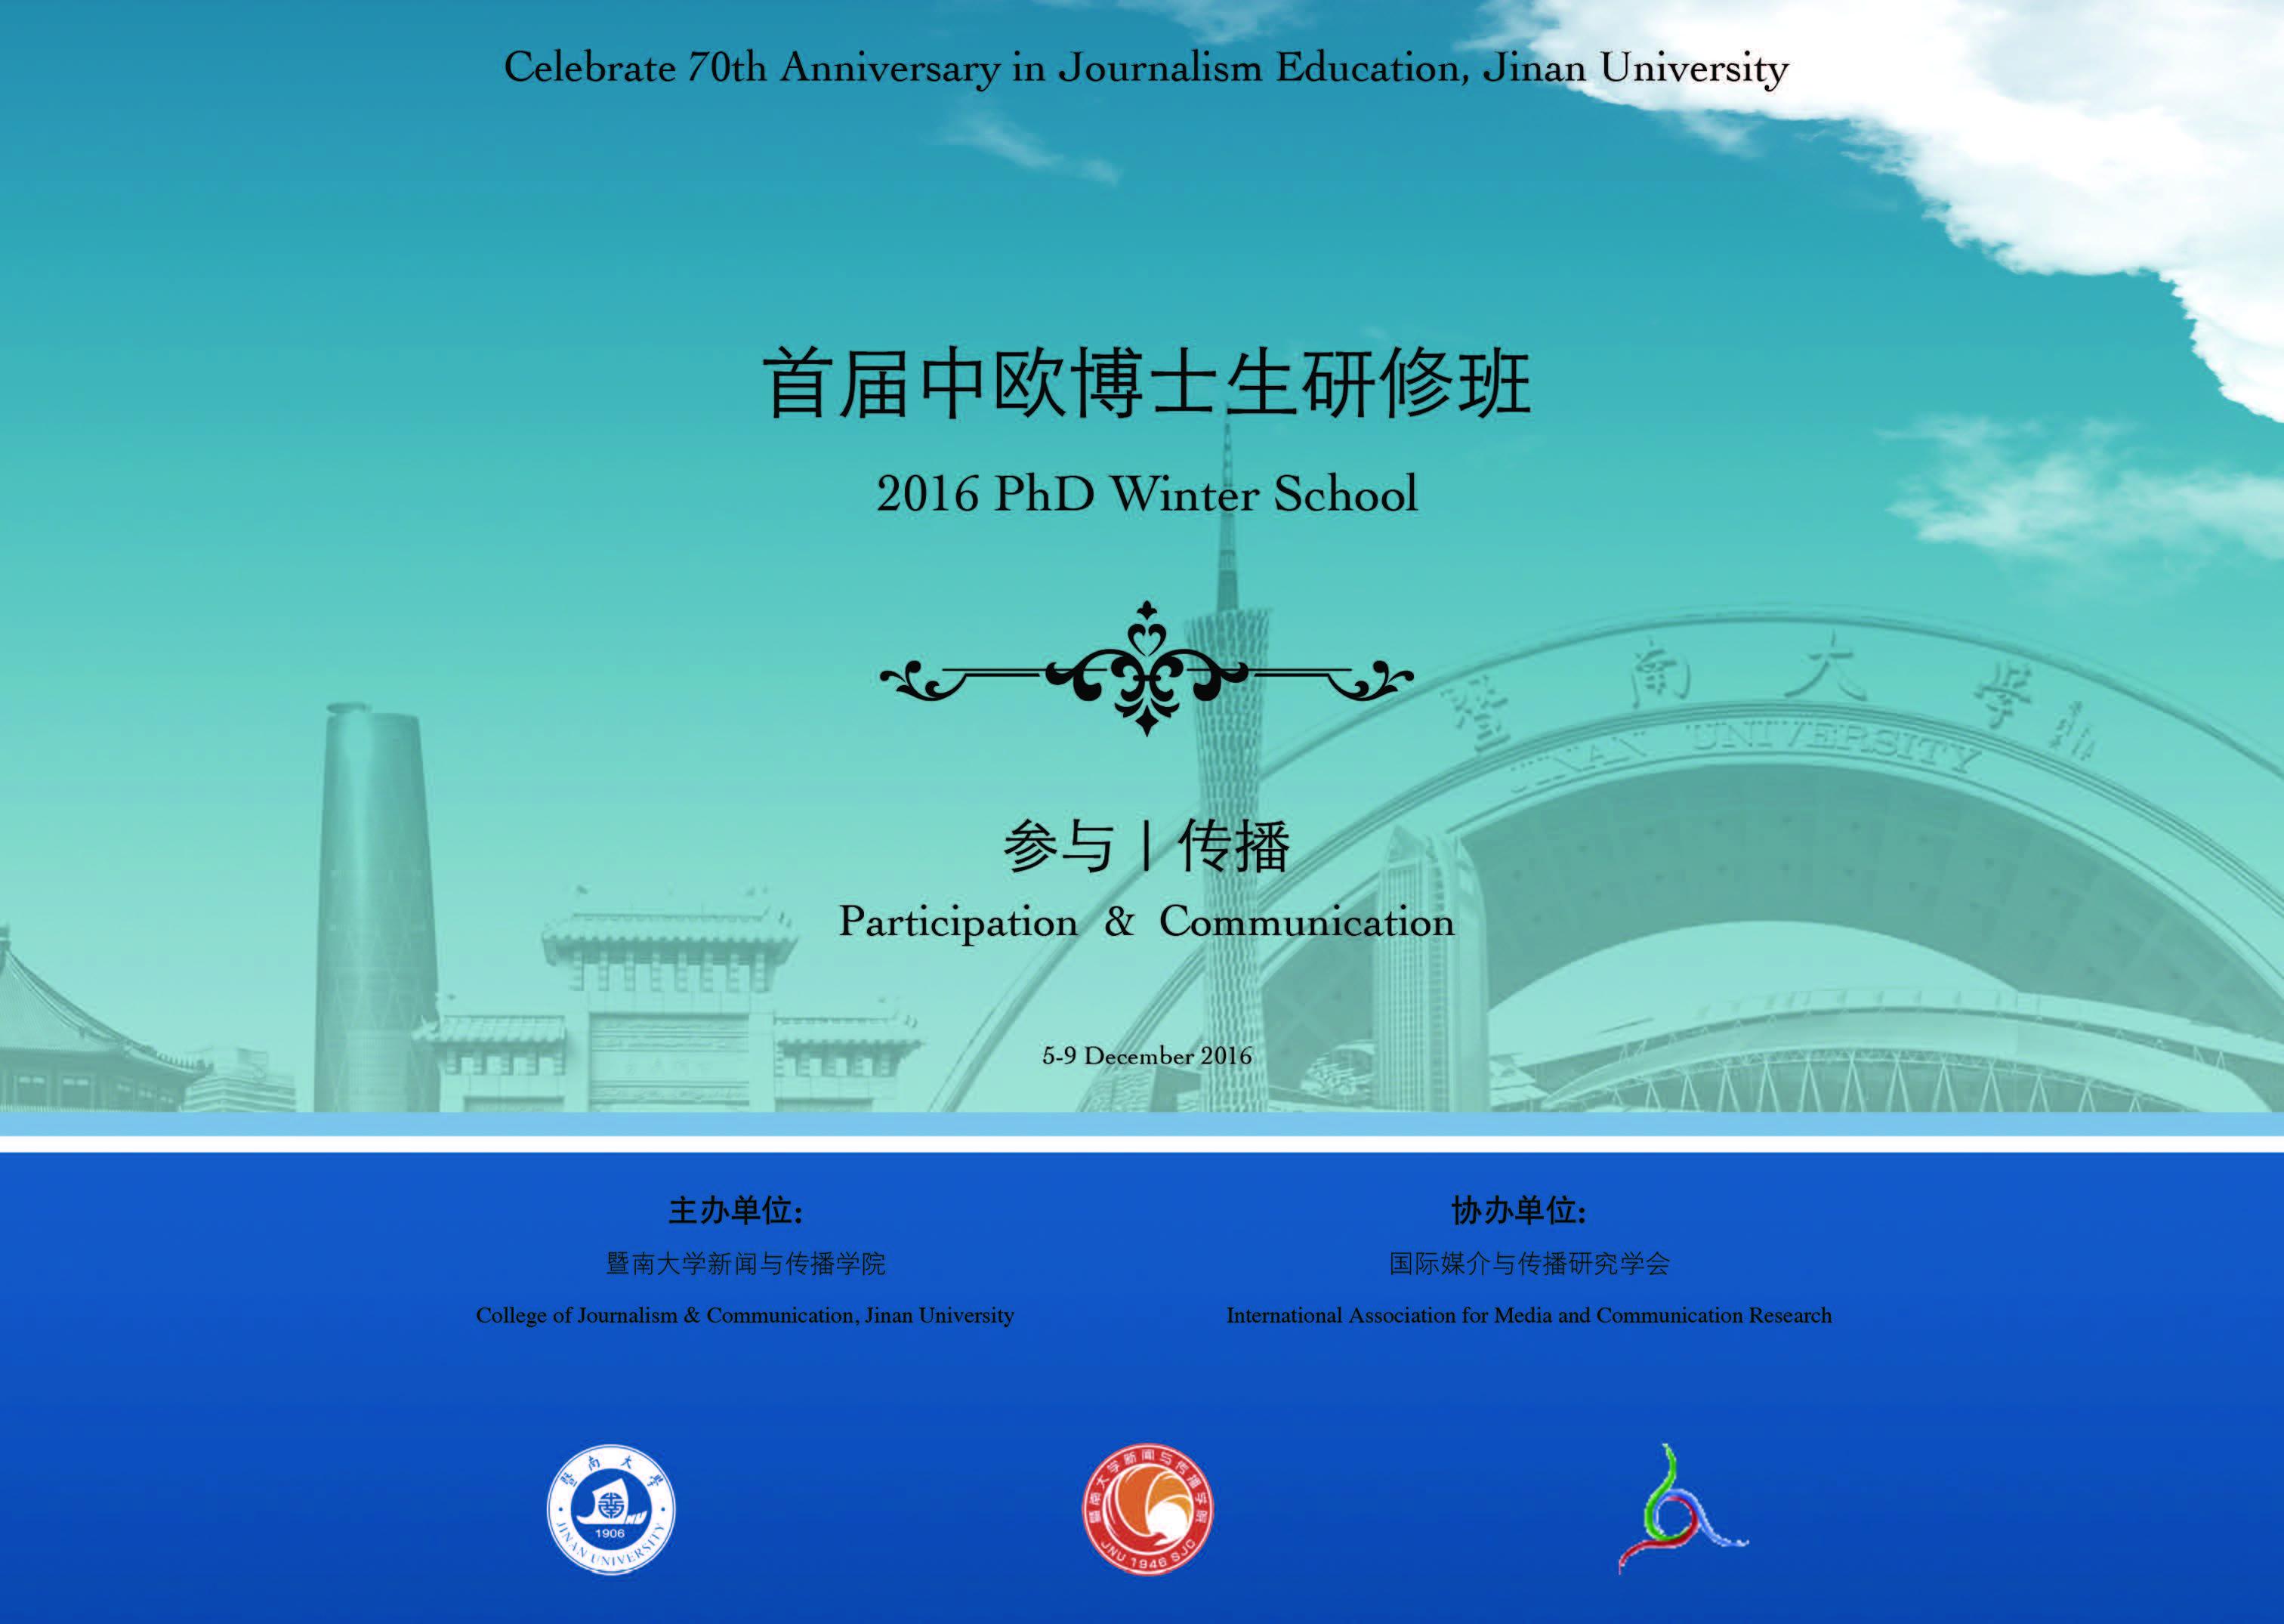 2016 PhD Winter School on Participation & Communication